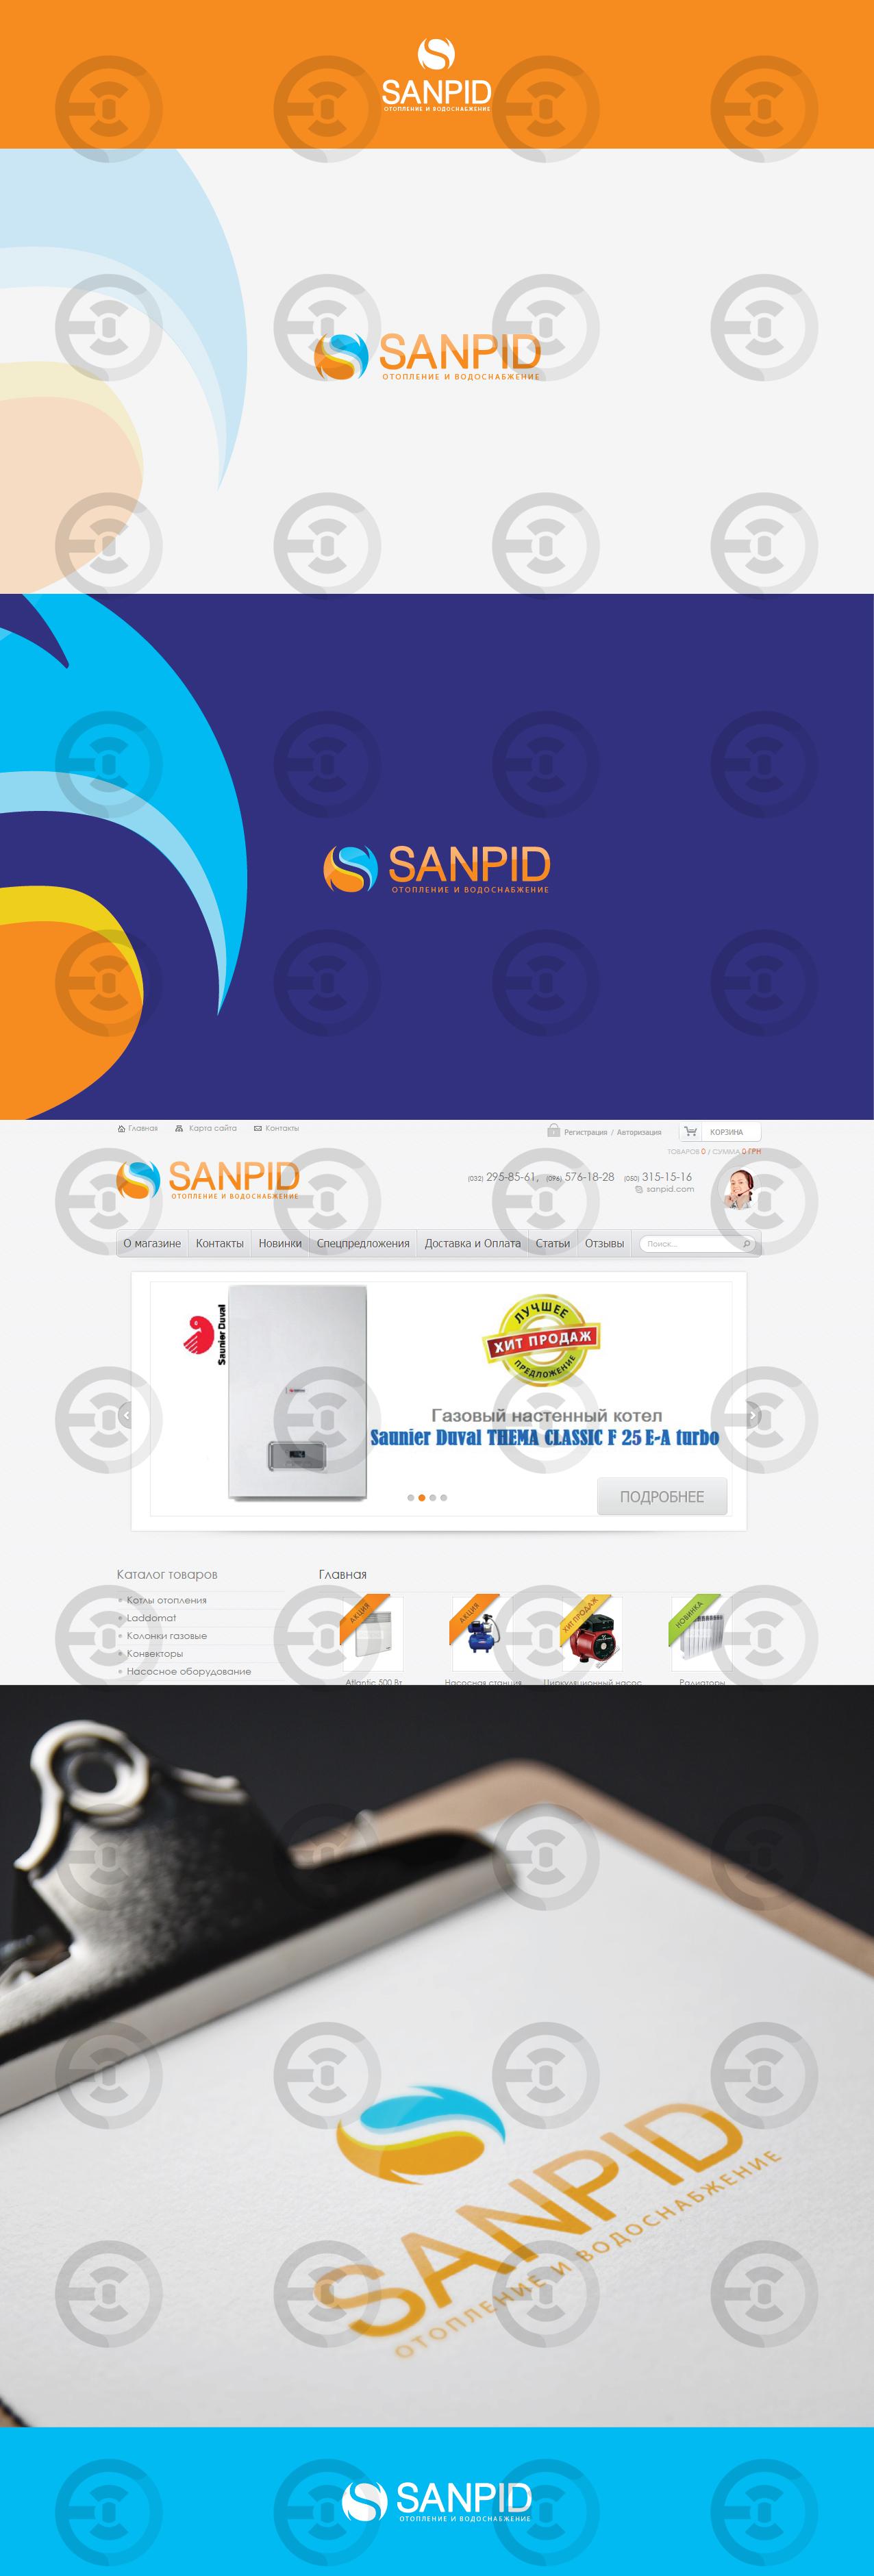 SANPID.jpg